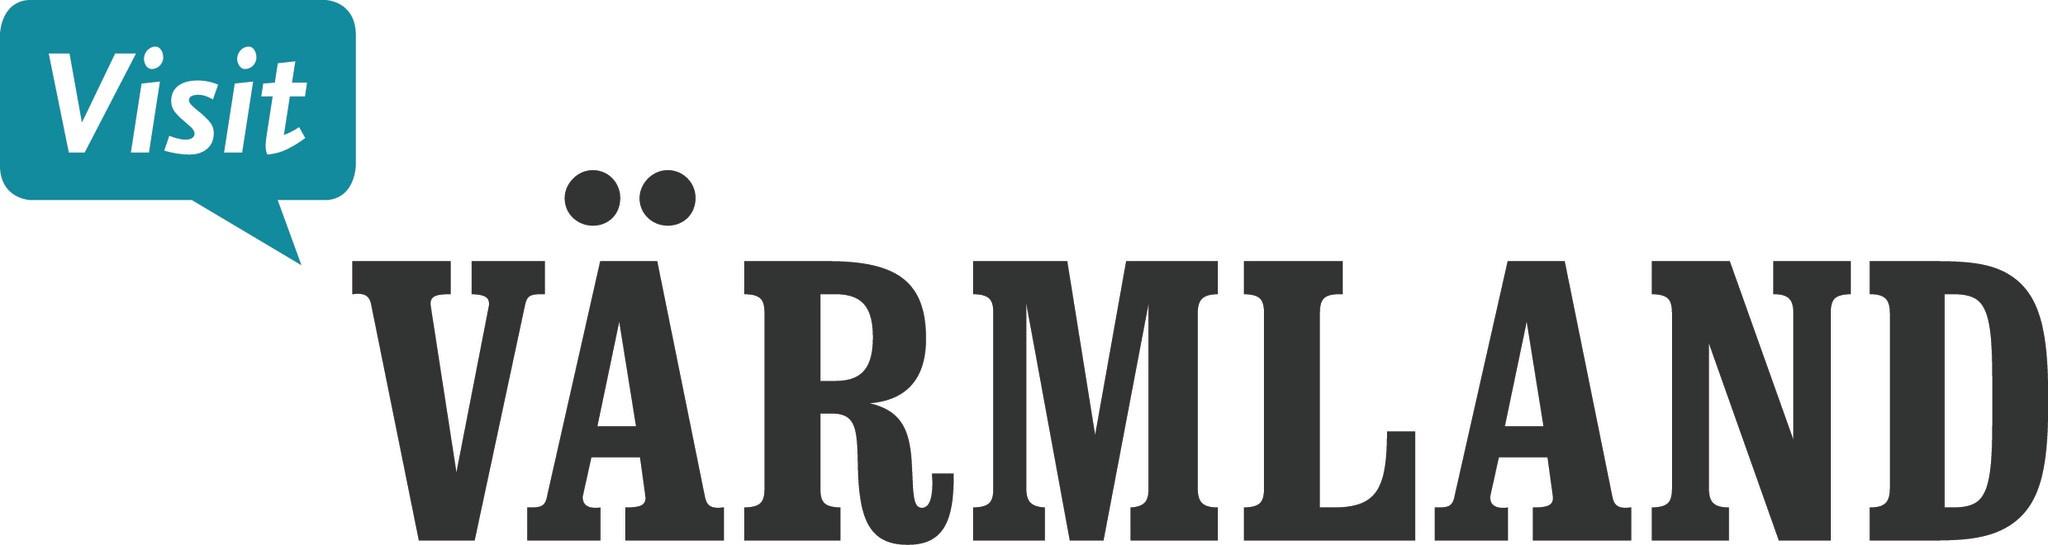 visit-värmland-logo-w